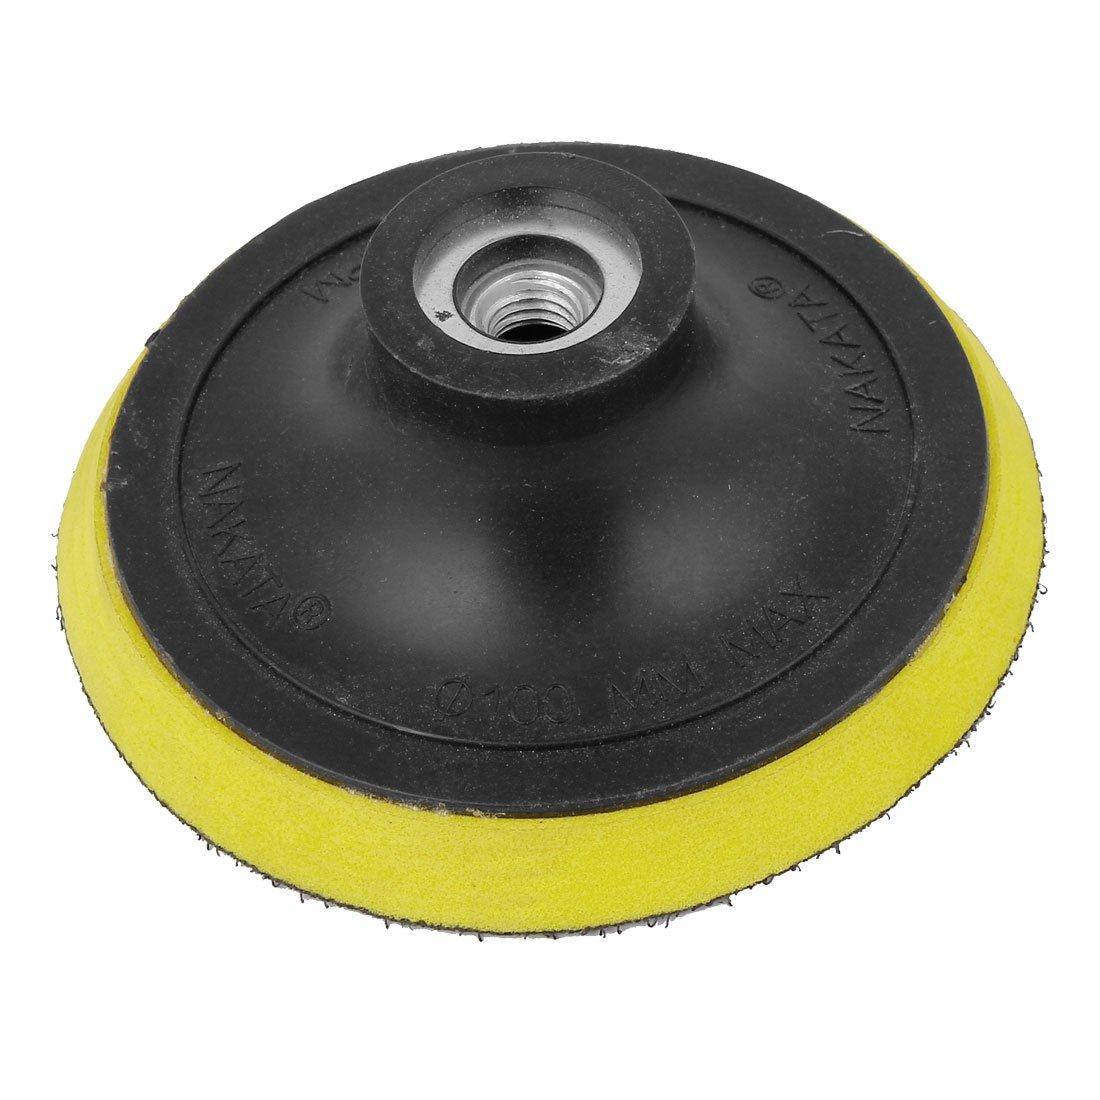 uxcell Angle Grinder Sanding Polishing Hook and